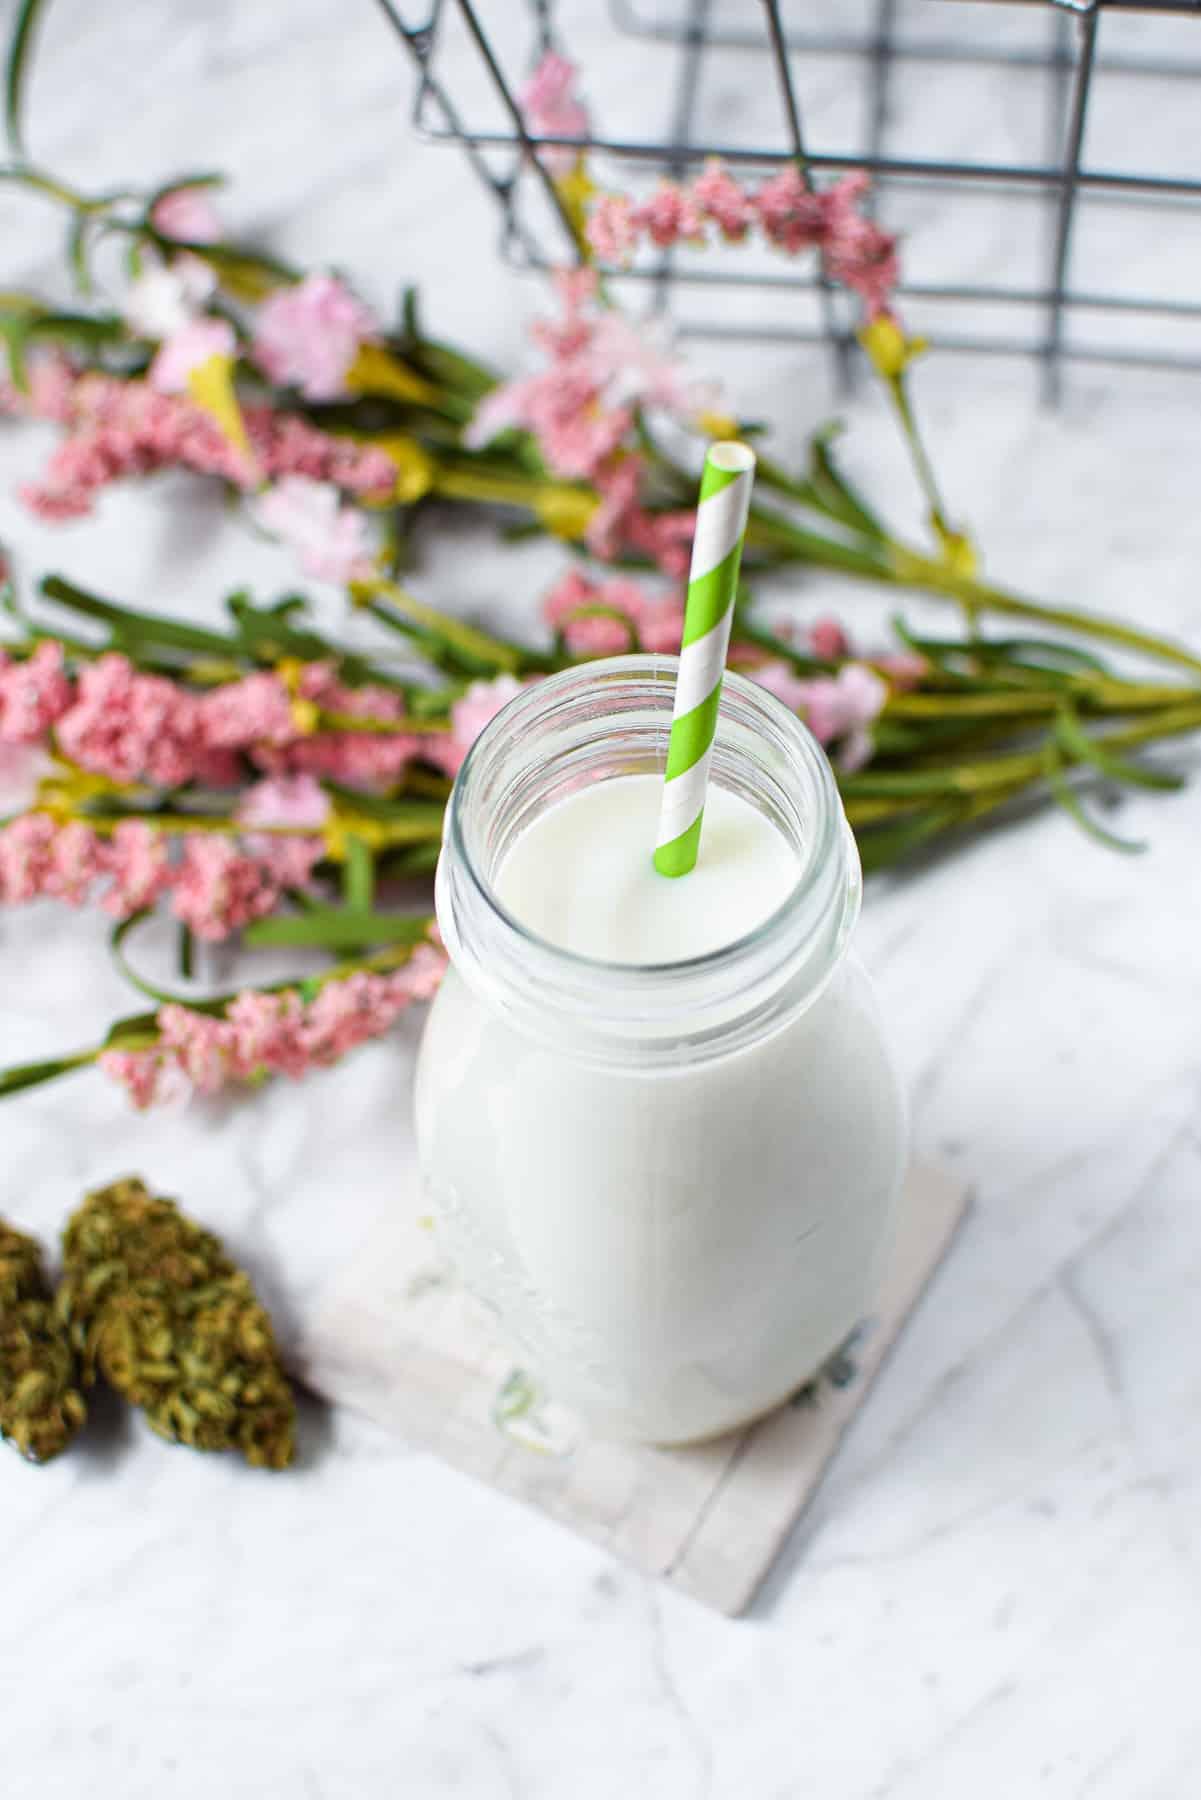 How to Make Cannabis Milk or Cream